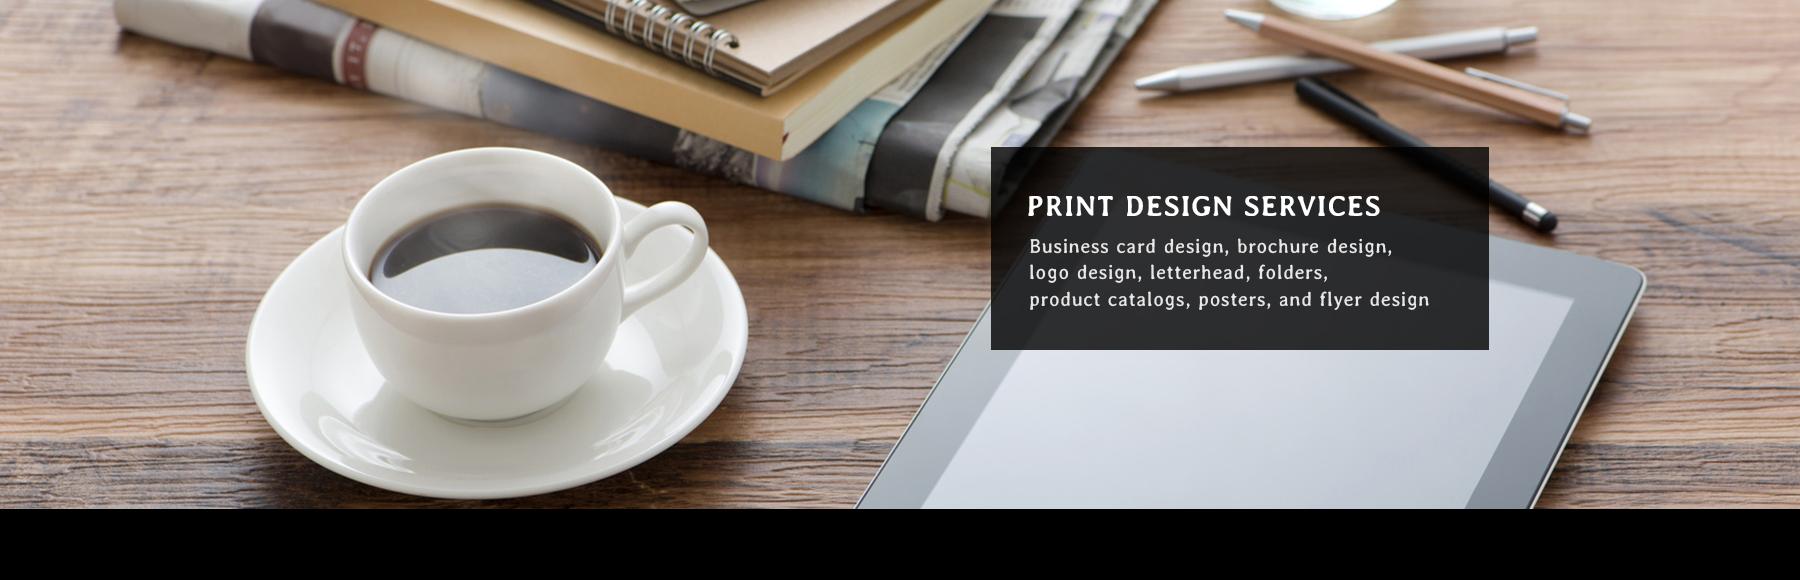 Print-Design-Services